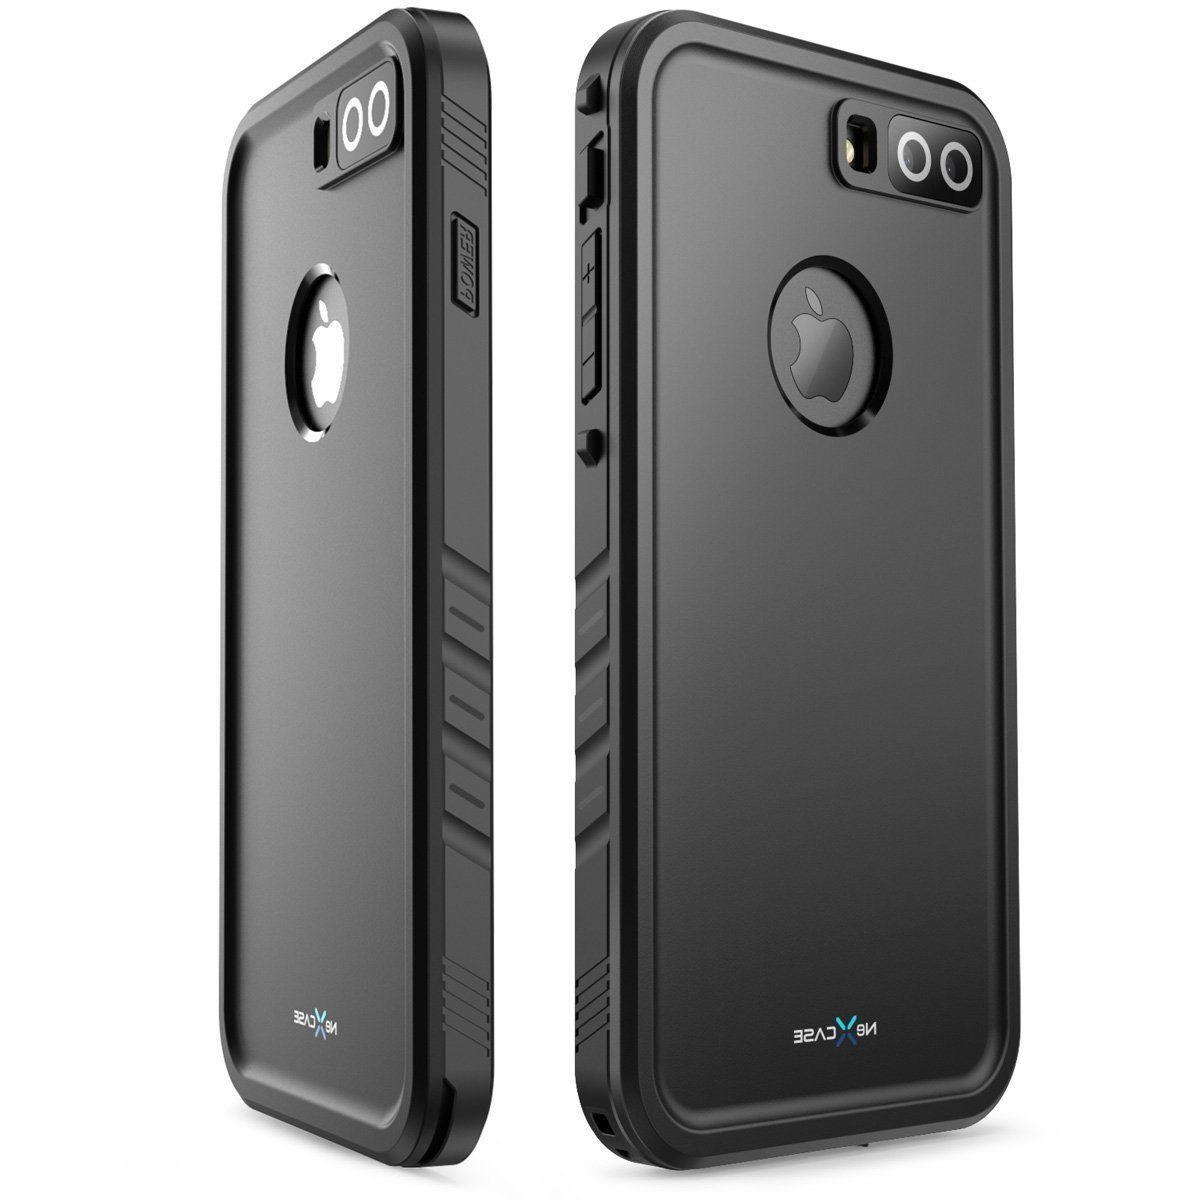 iPhone 7 / 7 + PLUS Case: NexCase Waterproof Full Cover Inte